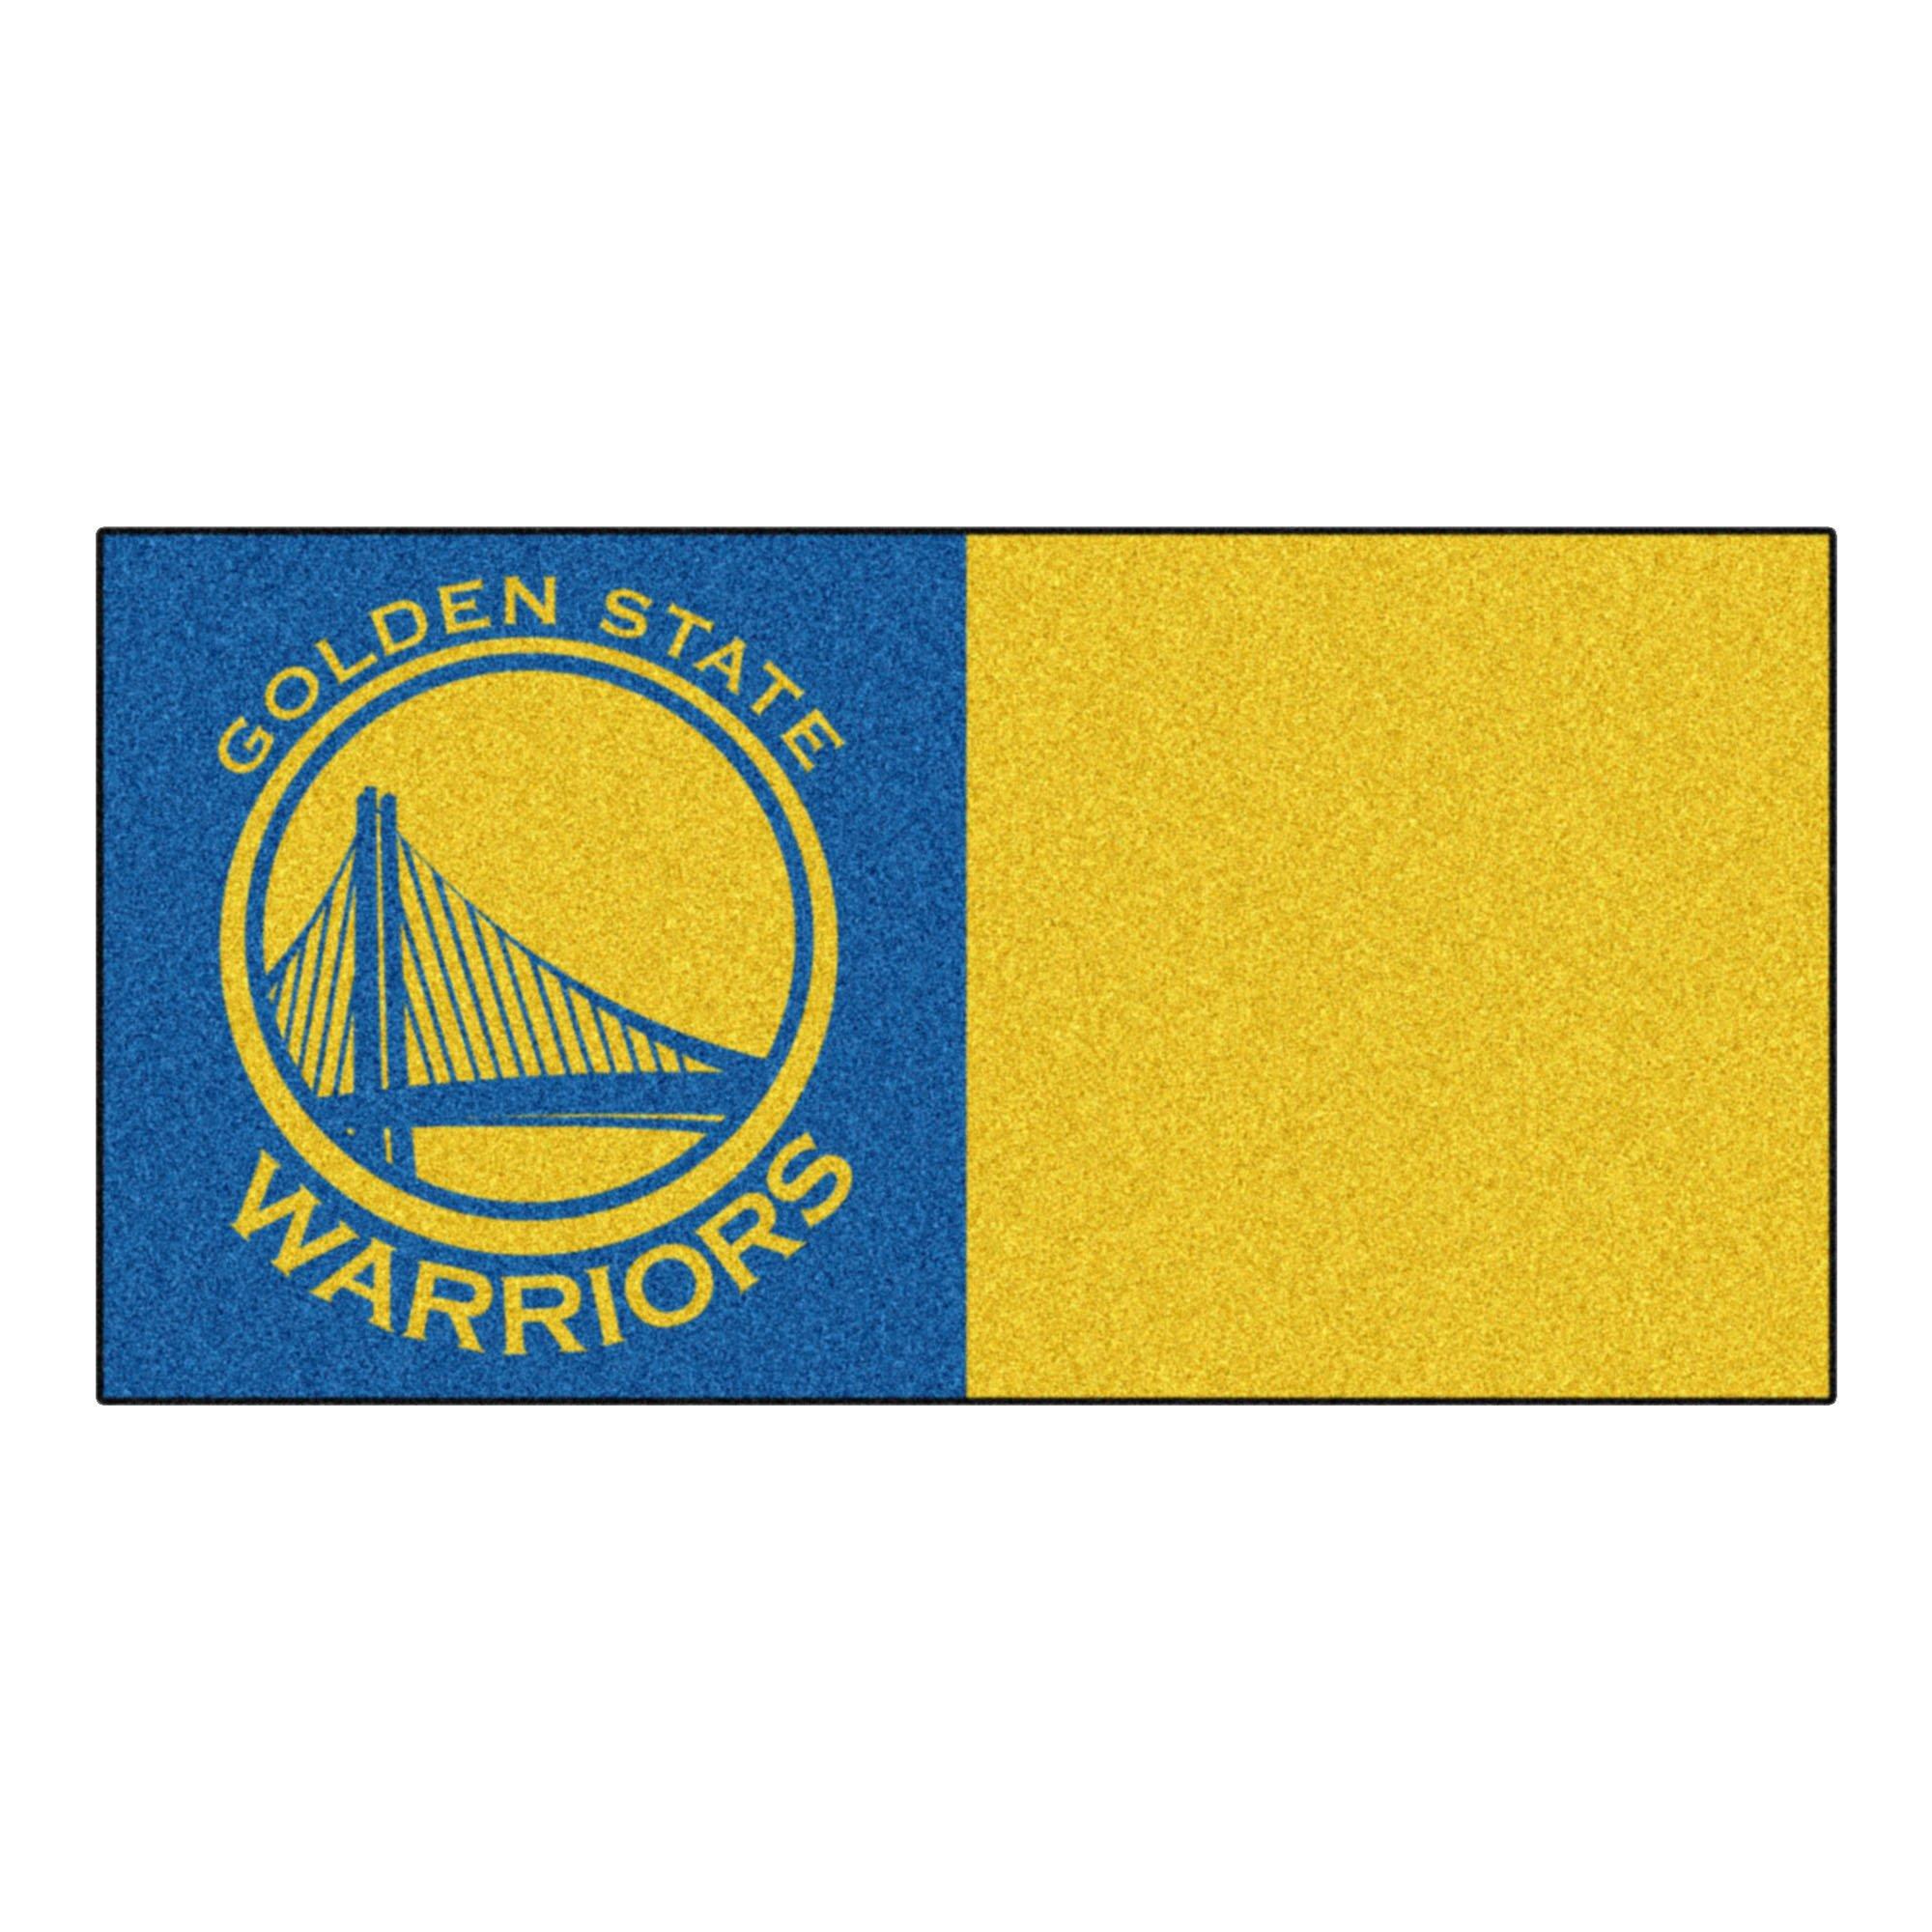 FANMATS NBA Golden State Warriors Nylon Face Team Carpet Tiles